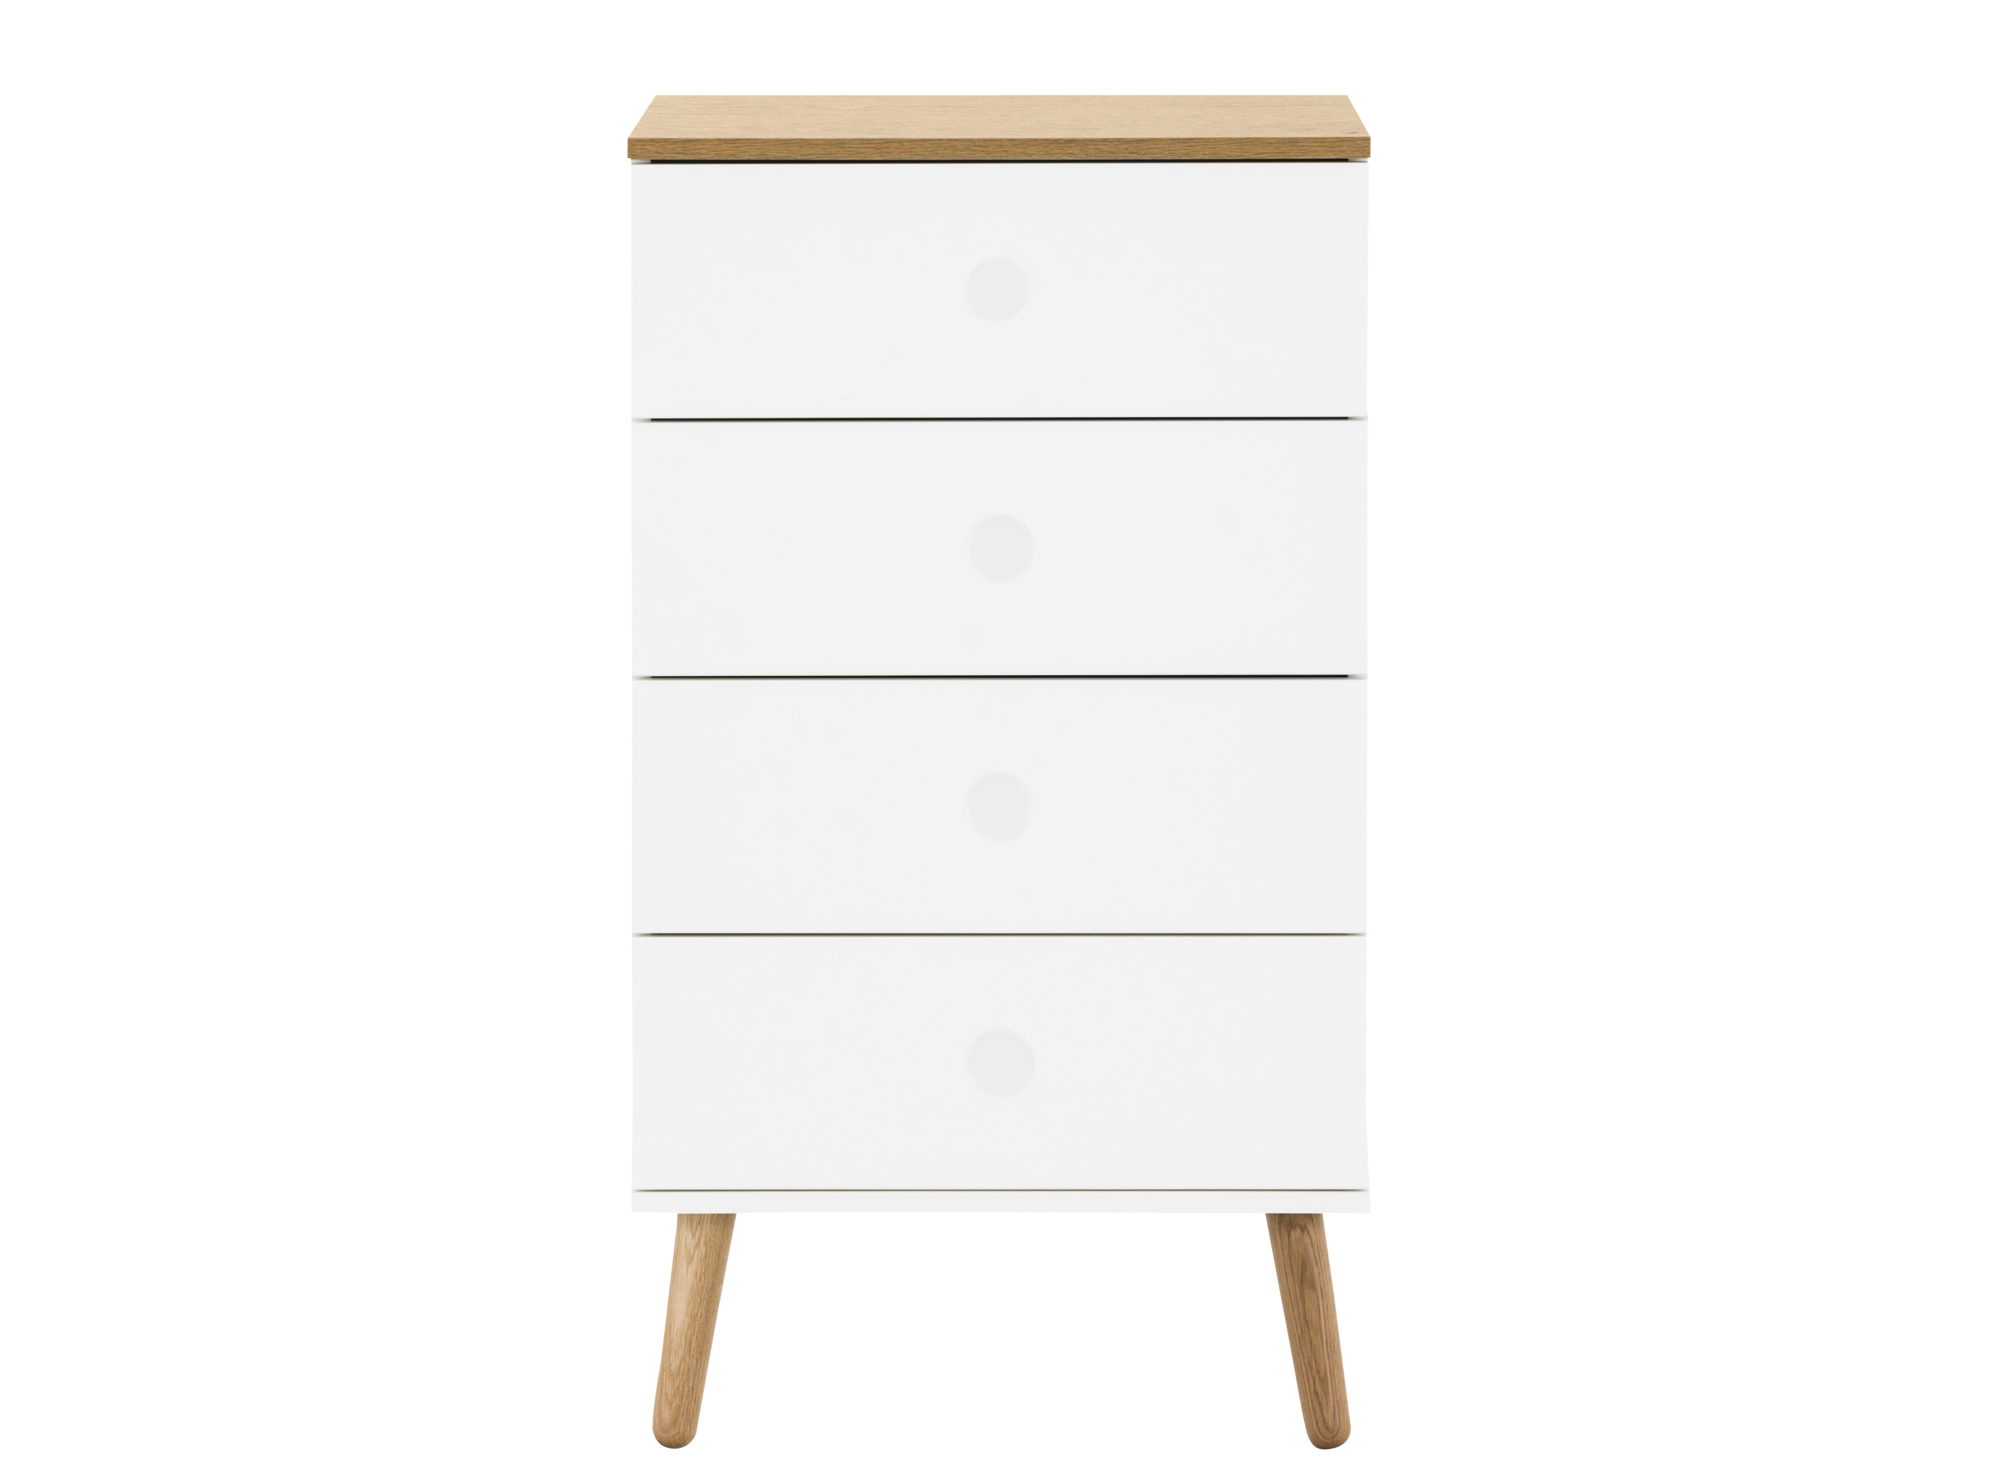 chiffonnier 4 tiroirs blanc pieds bois fly. Black Bedroom Furniture Sets. Home Design Ideas